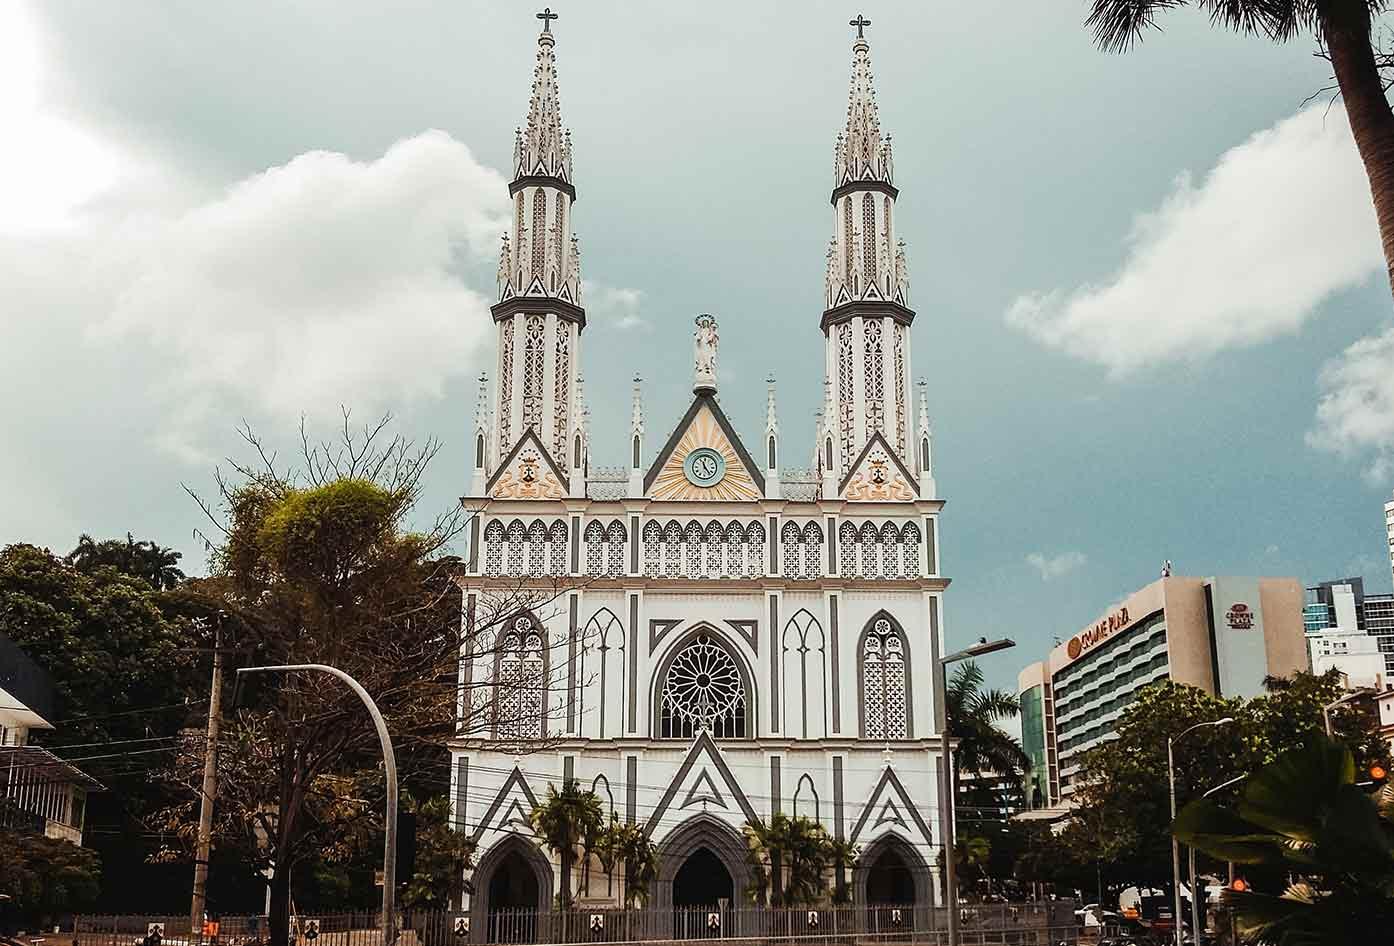 panama city church